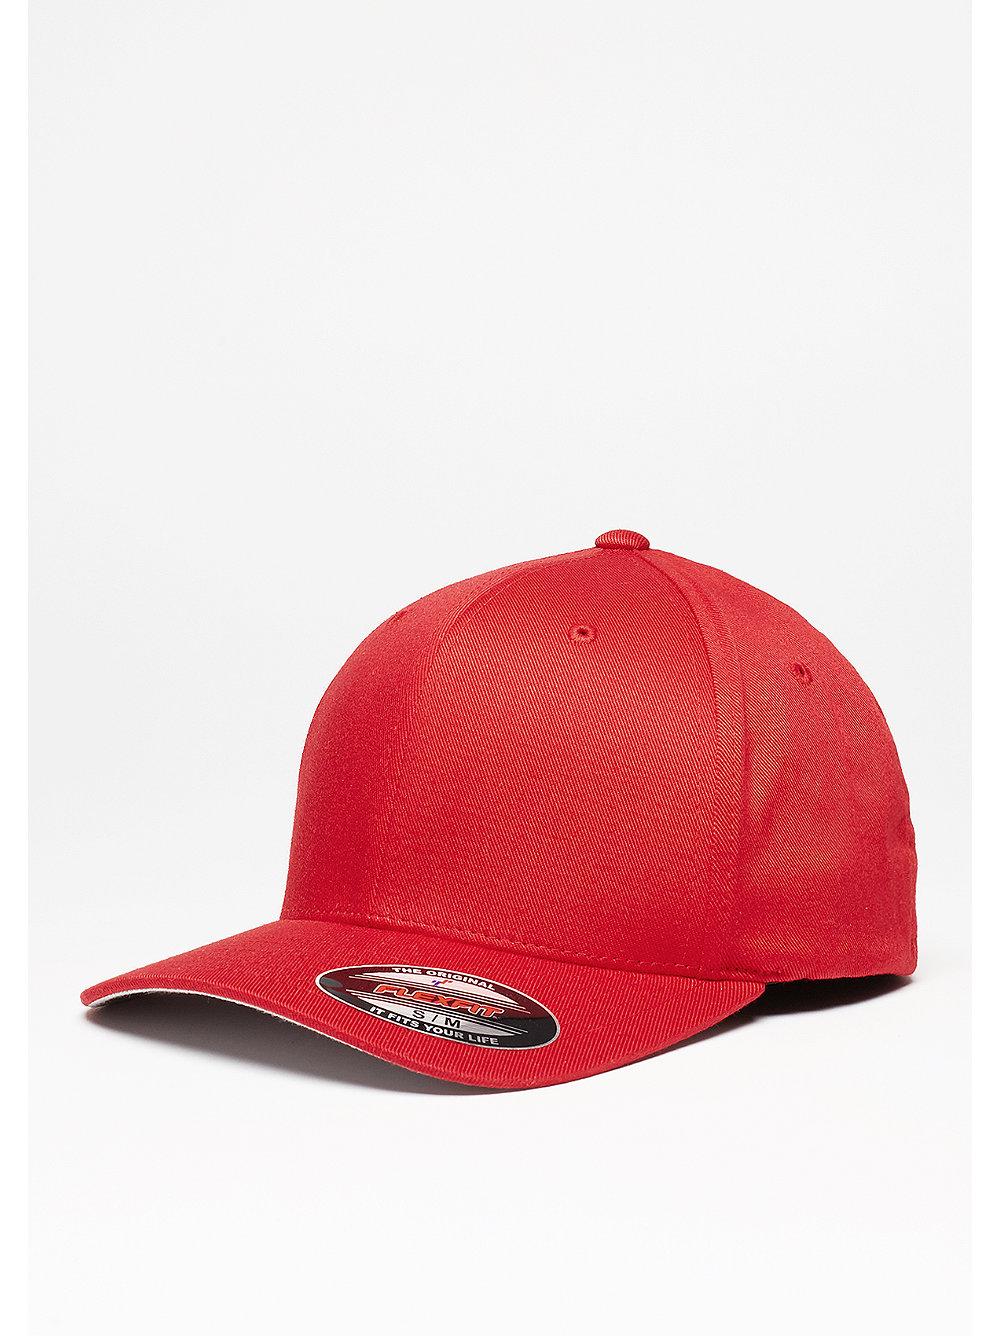 flexfit baseball cap red bei snipes bestellen. Black Bedroom Furniture Sets. Home Design Ideas